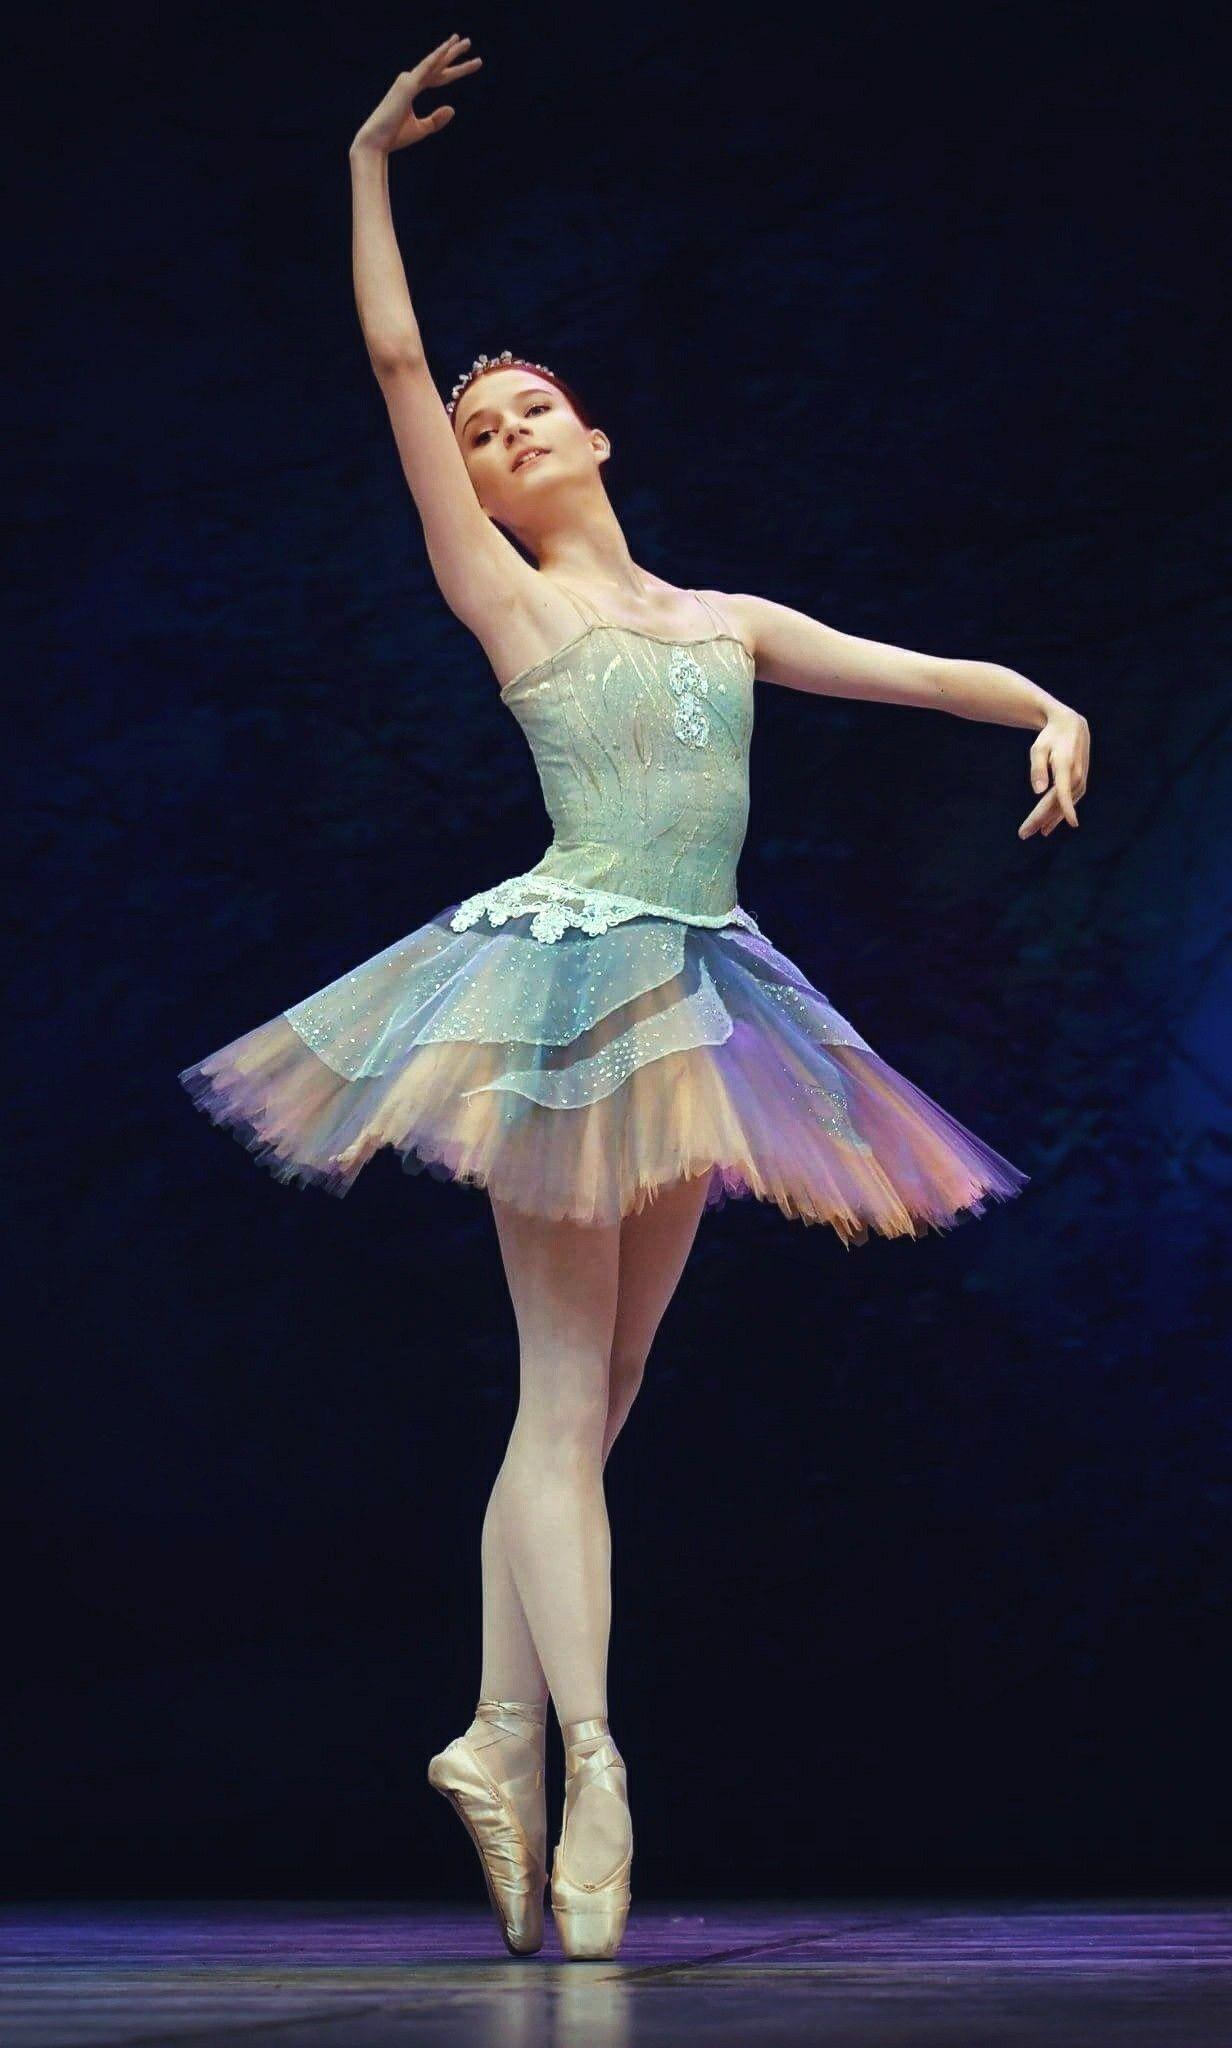 Pin by Deborah Moore on Dance | Ballet costumes, Ballet